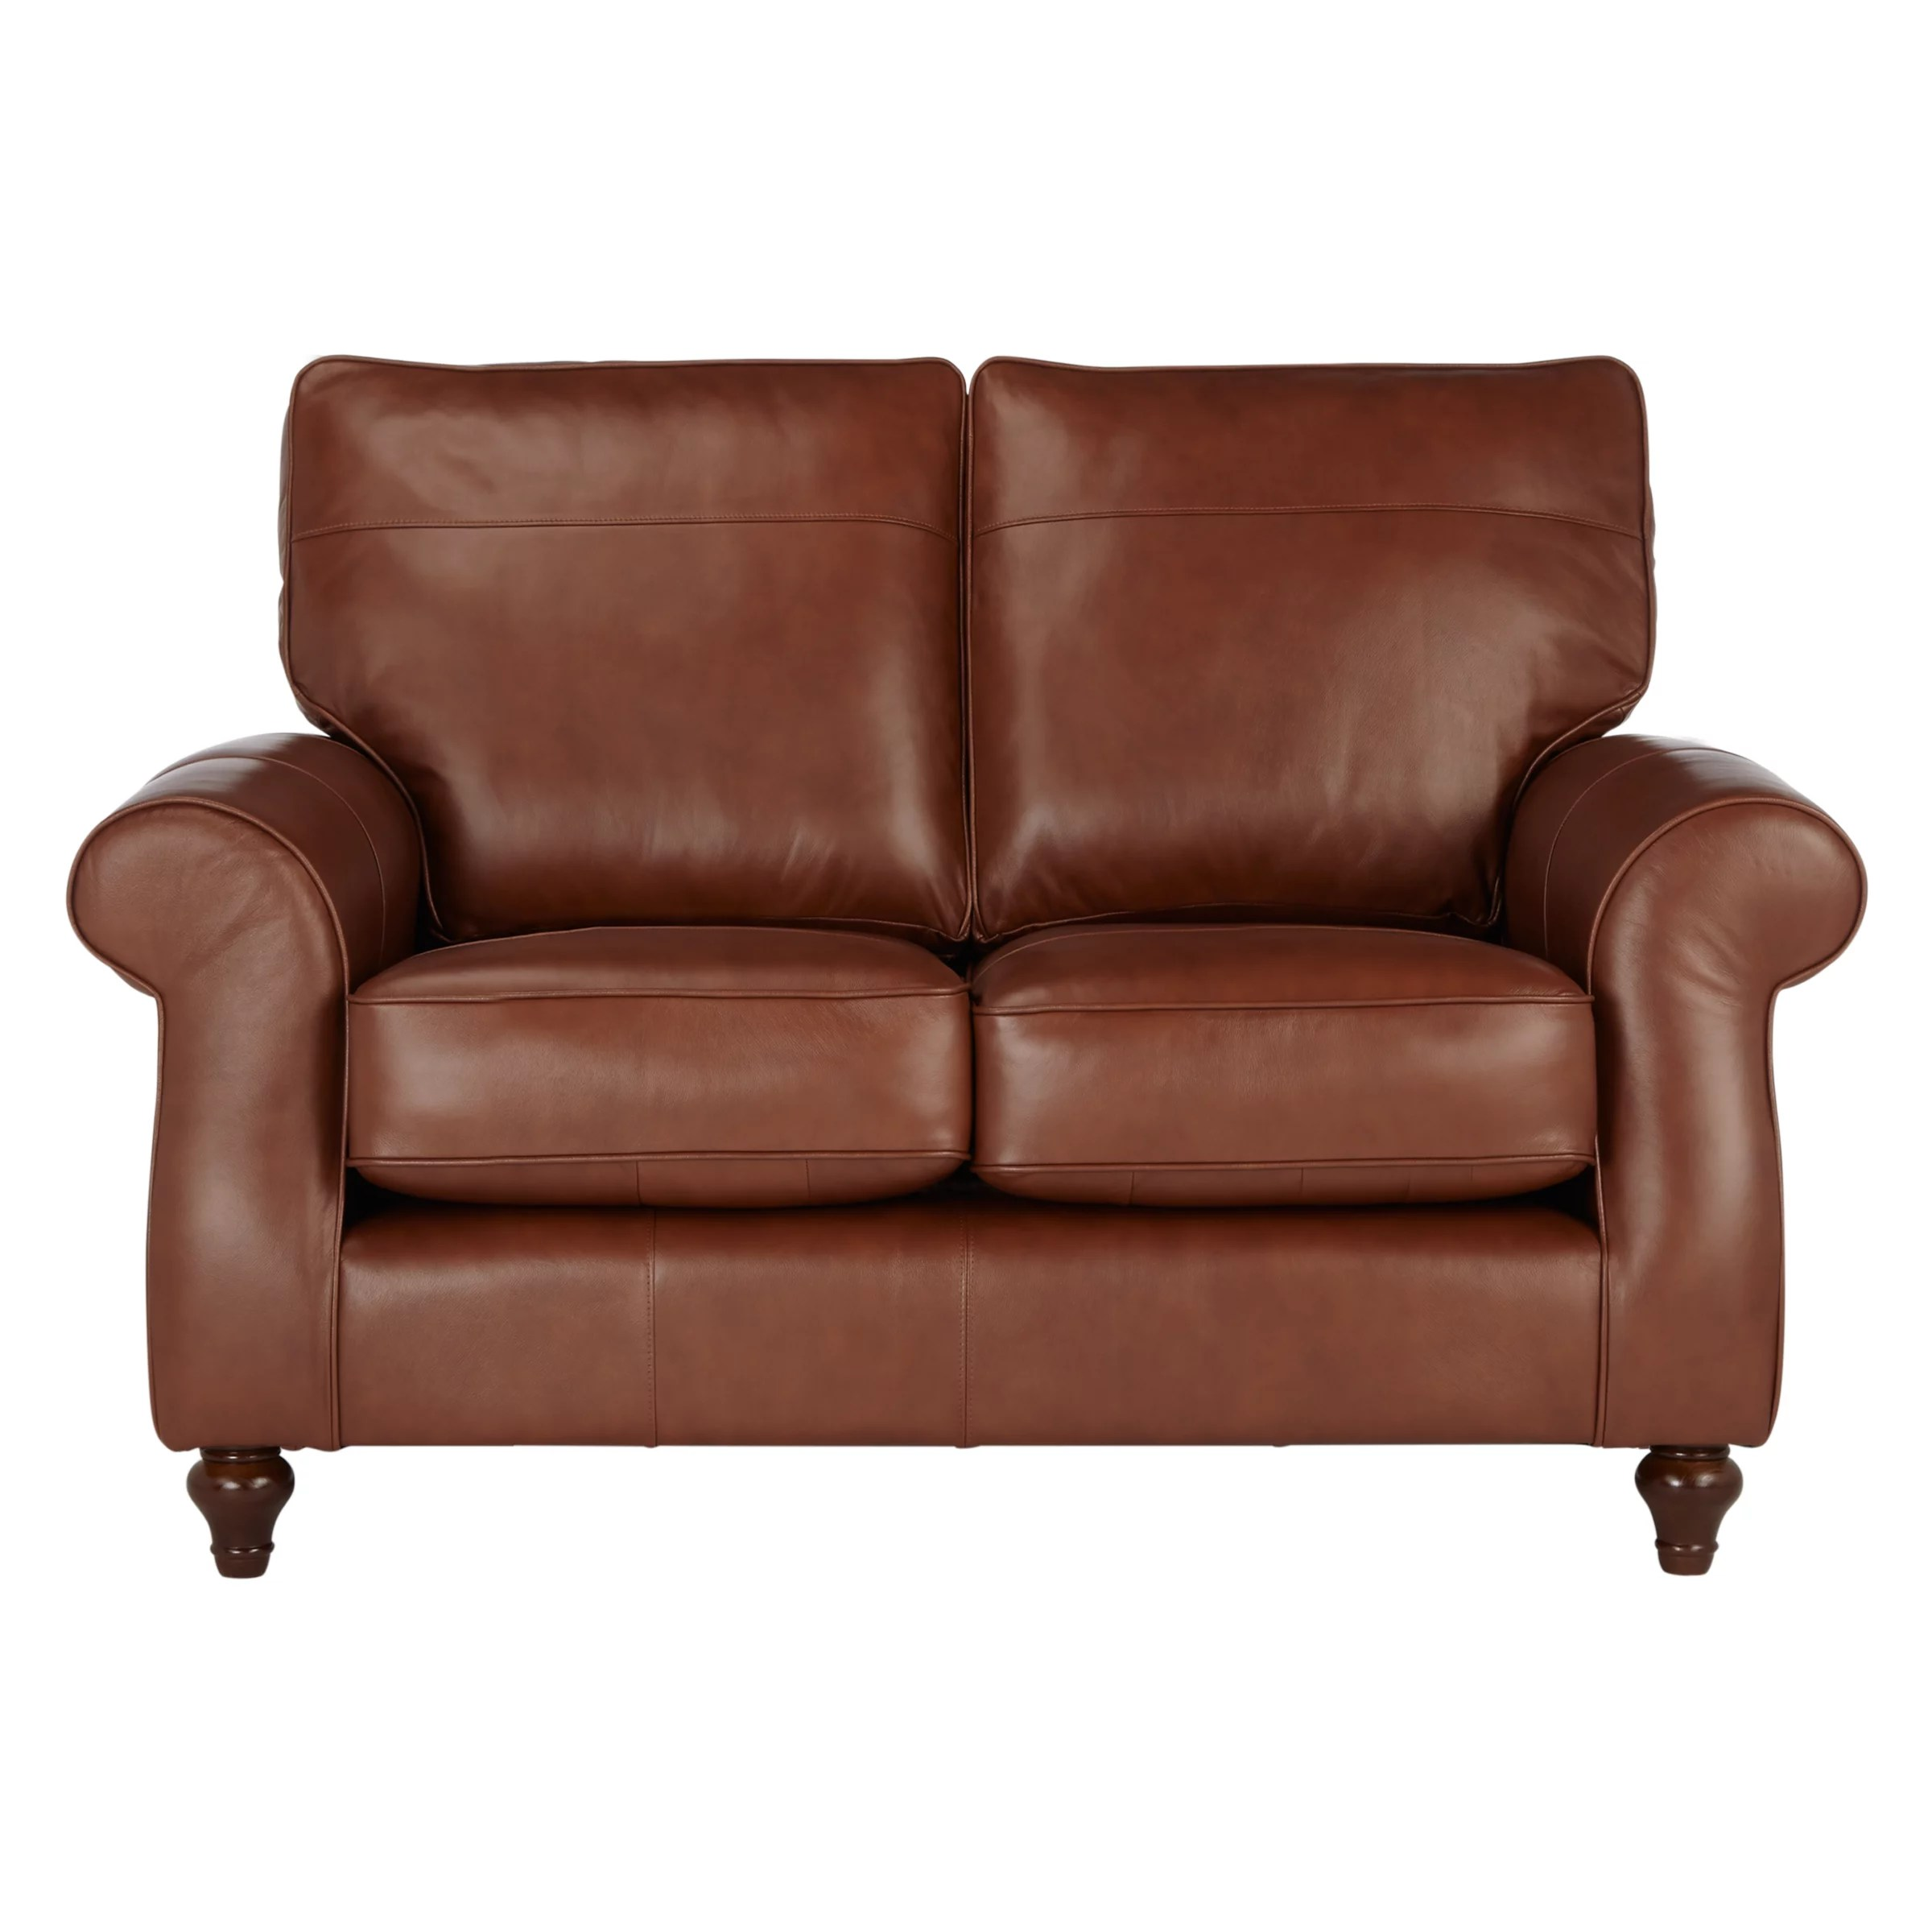 halo kensington leather sofa corner beds spain john lewis energywarden